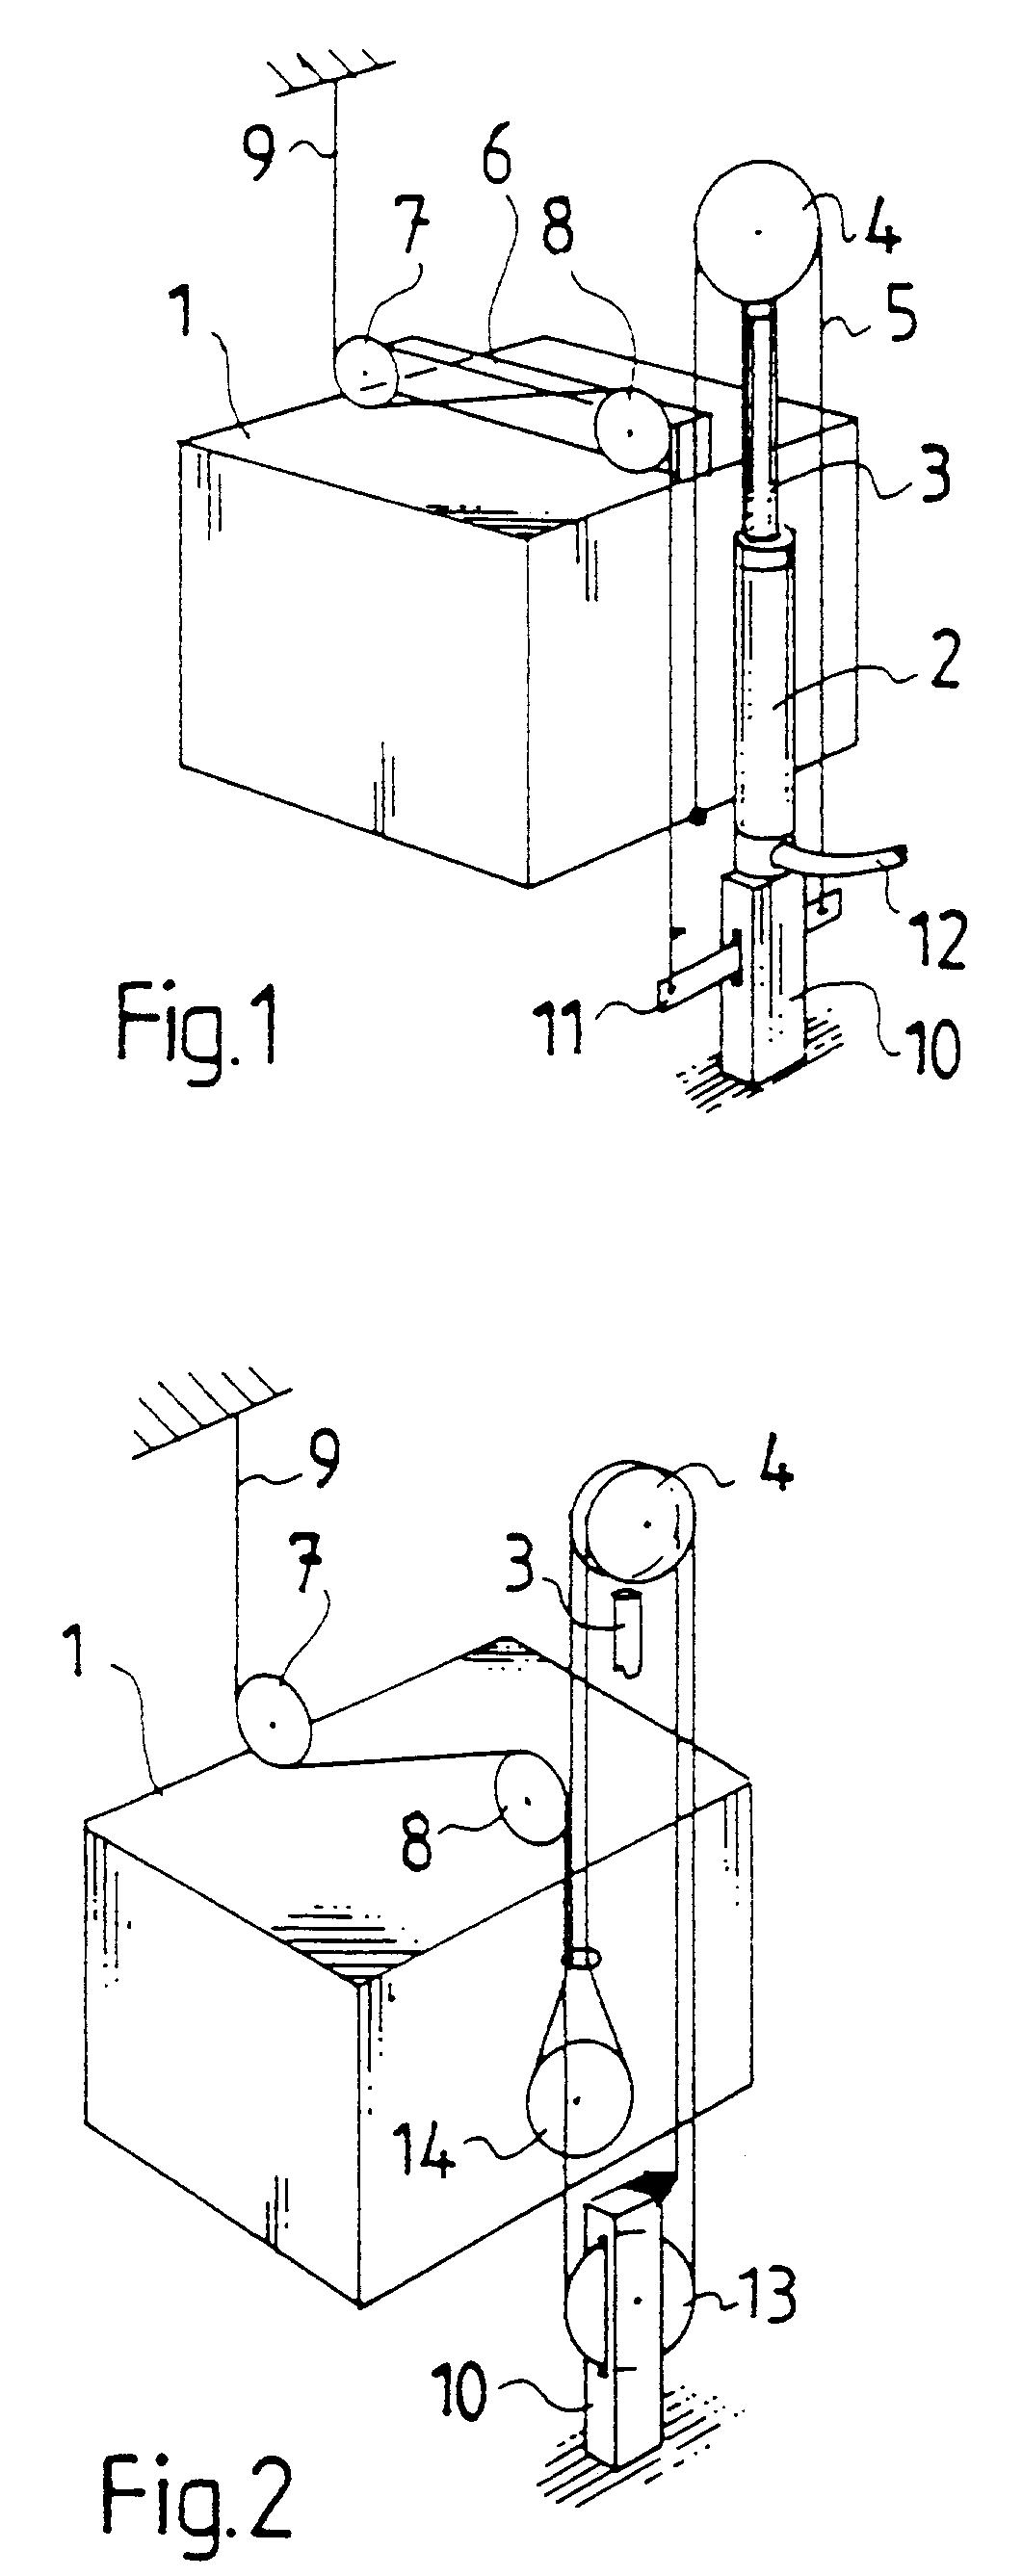 patent ep0401863b1 hydraulischer aufzug google patents. Black Bedroom Furniture Sets. Home Design Ideas